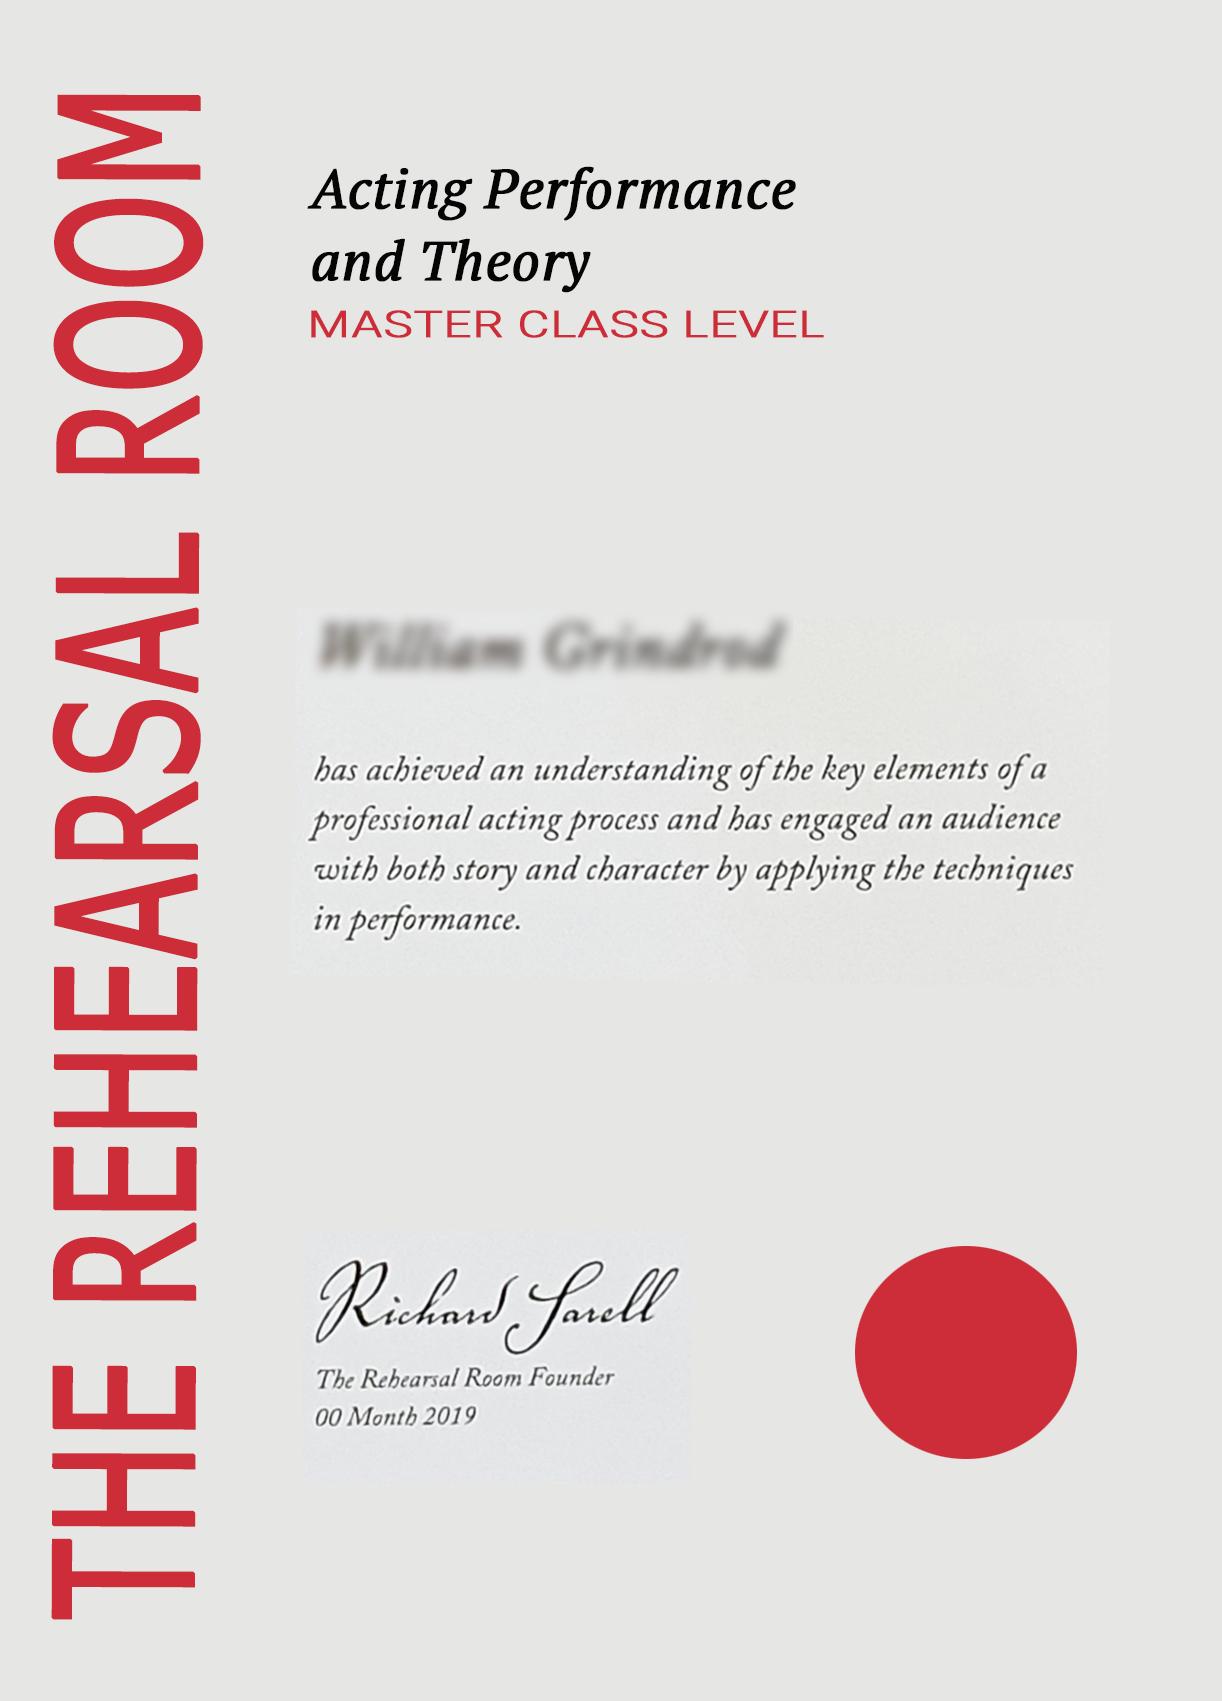 Graduate Certificate for MASTER CLASS actors